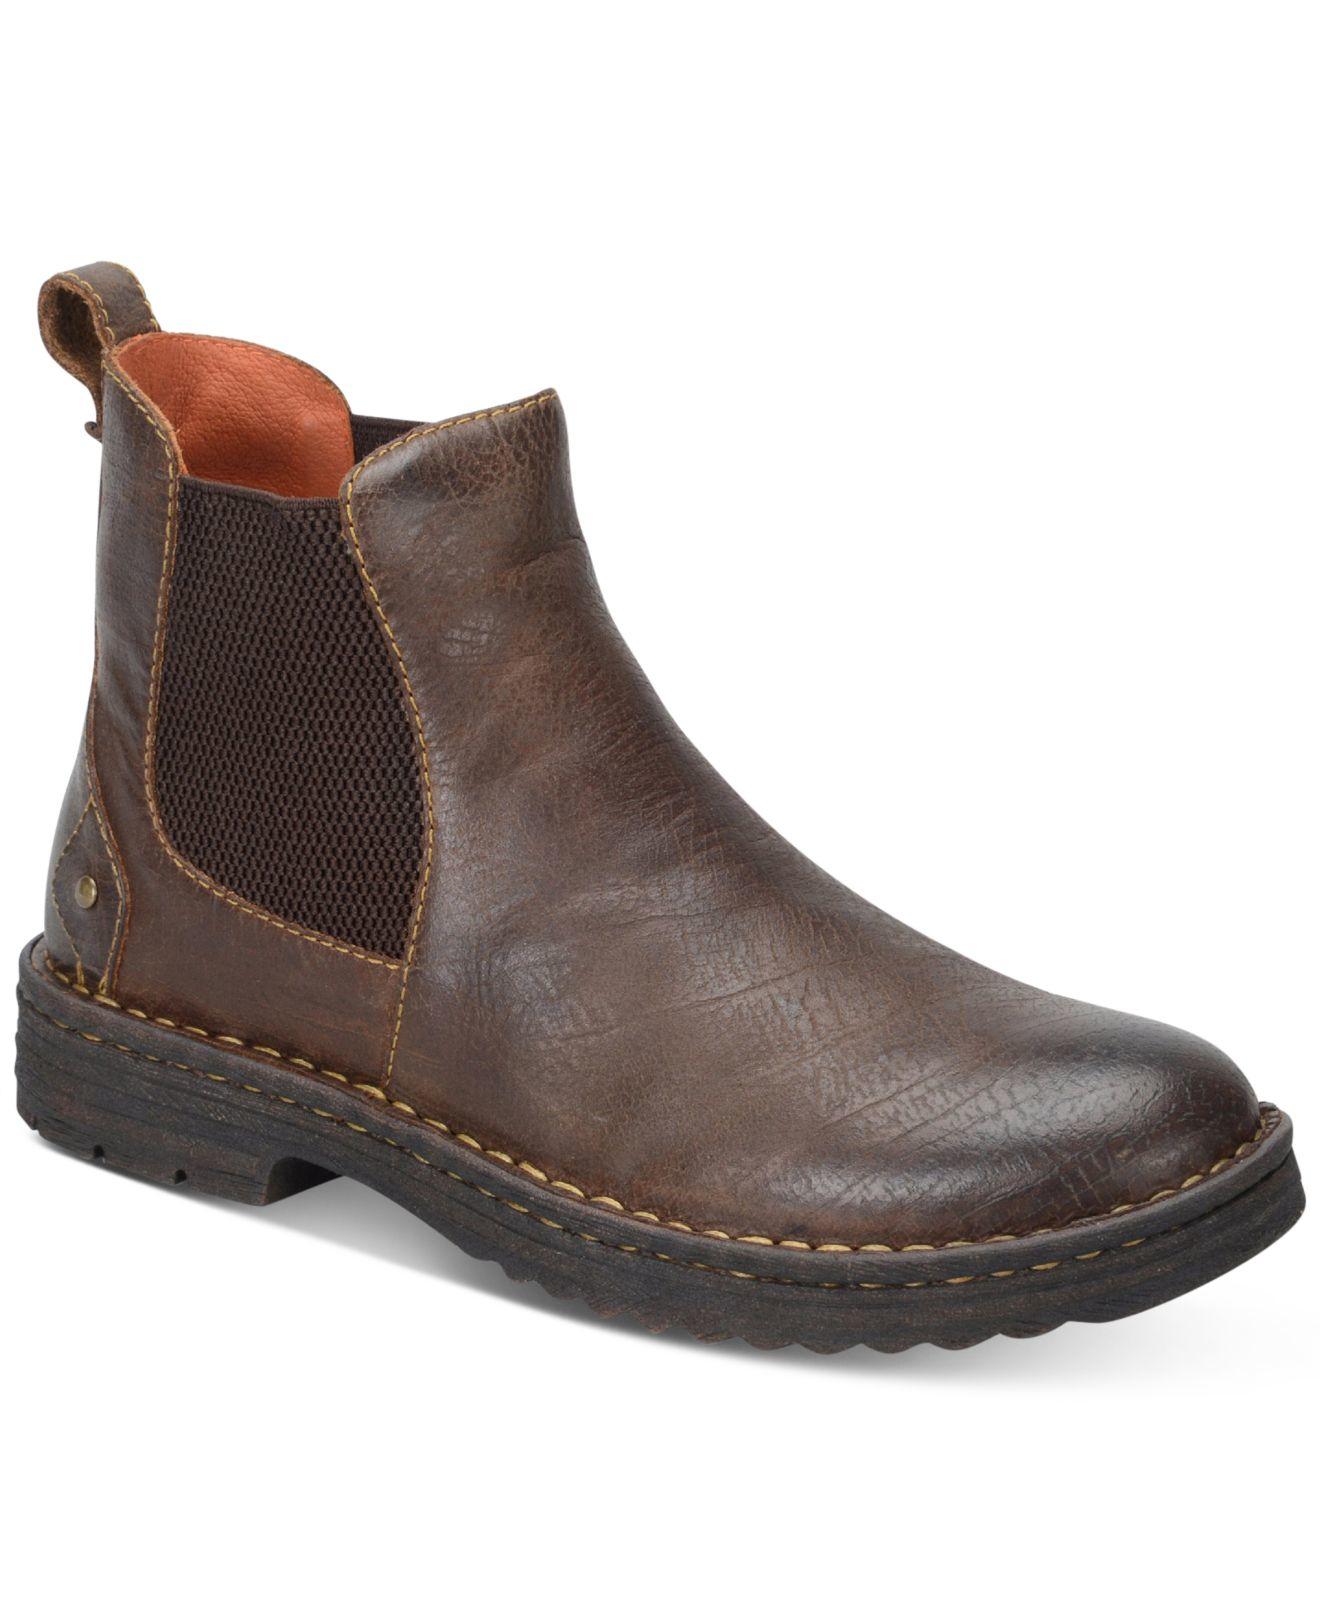 Macys Mens Shoes Brown